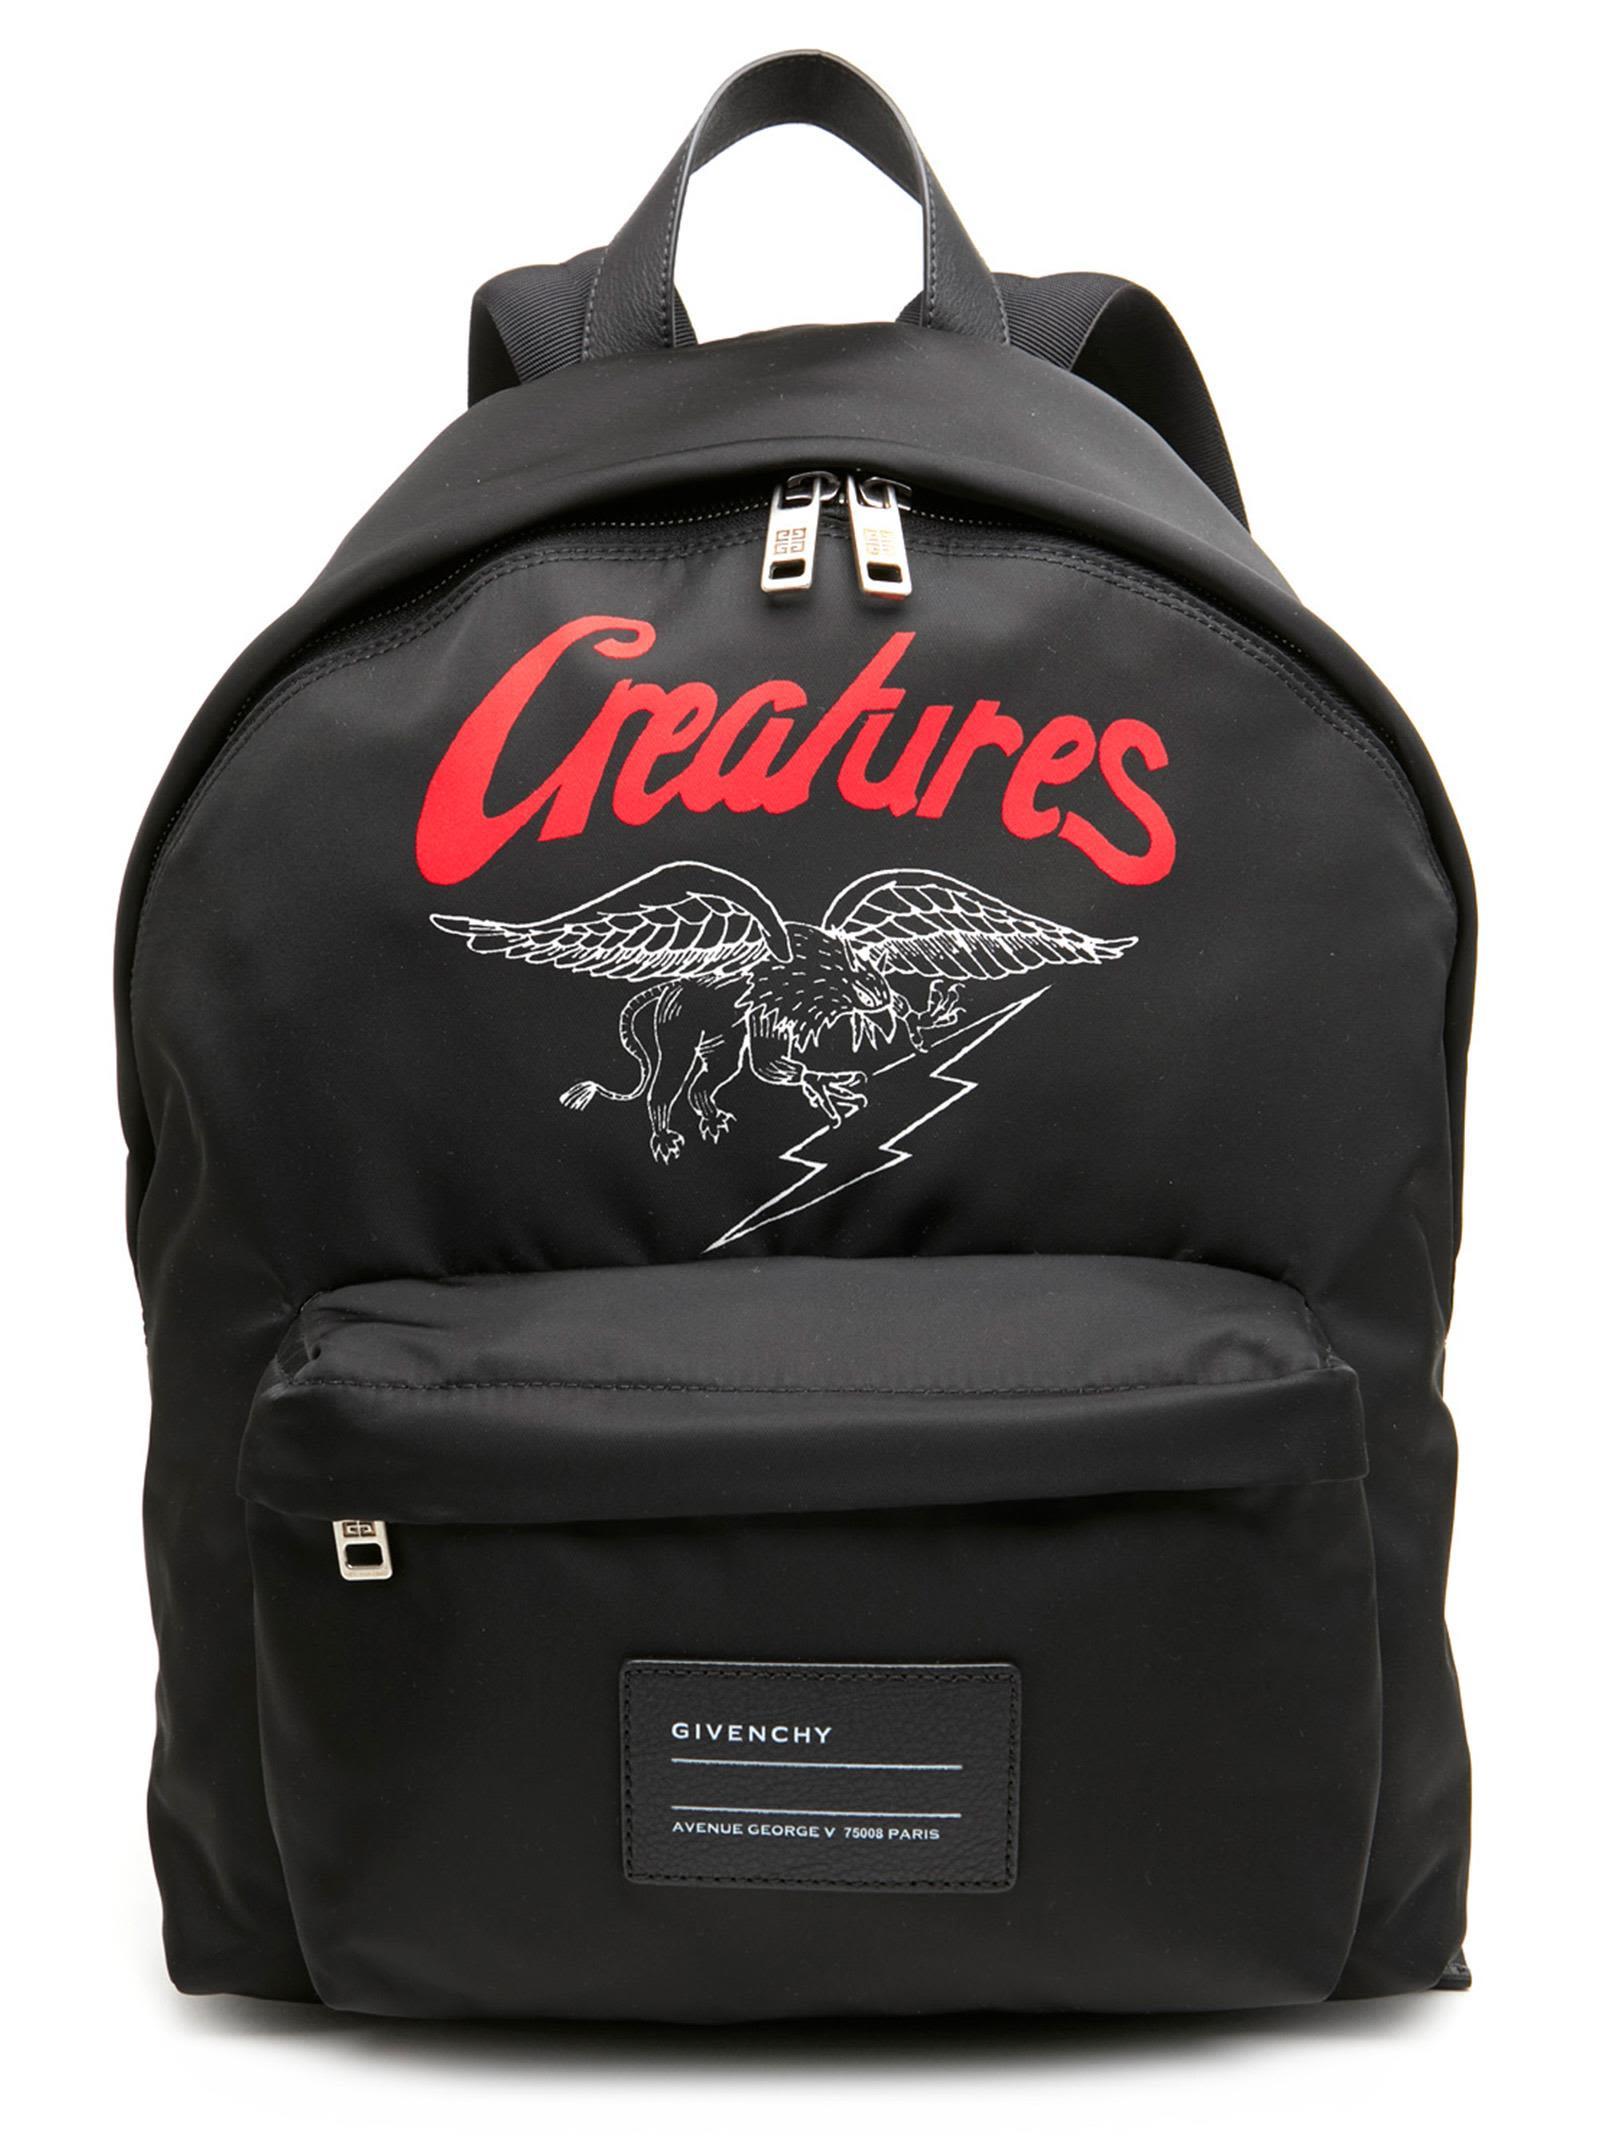 Givenchy 'creature' Bag